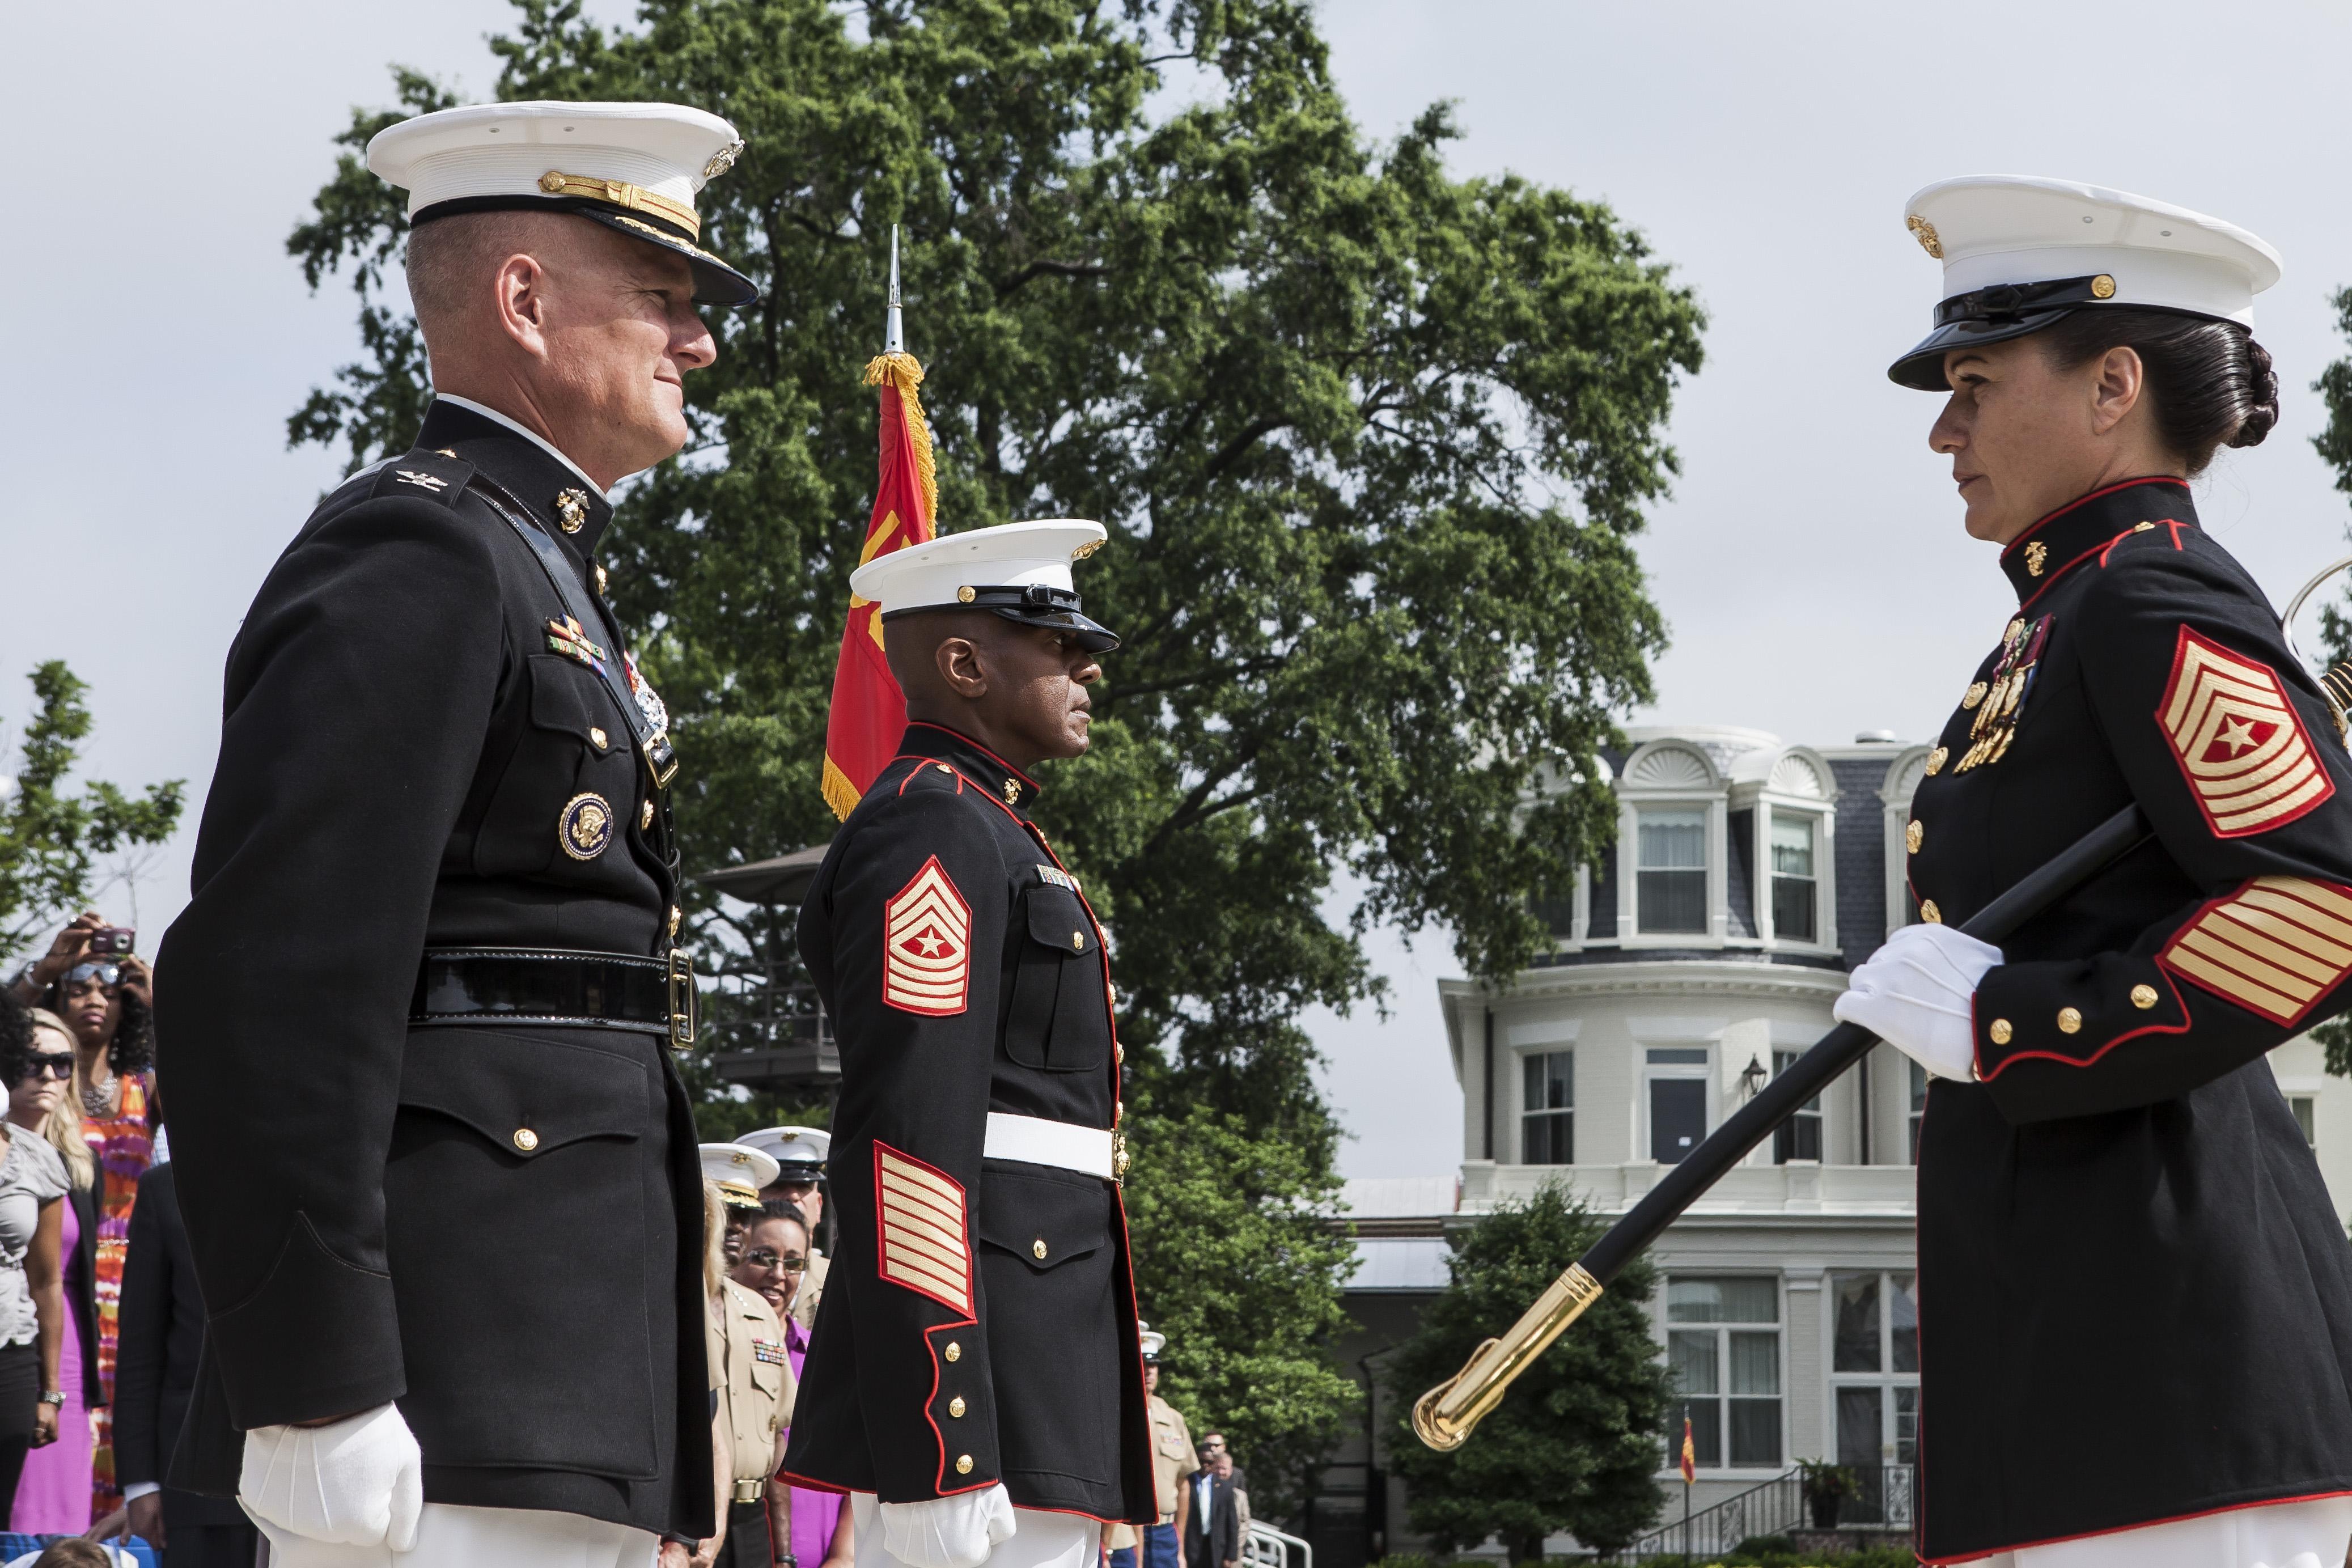 Marine corps evening dress uniforms